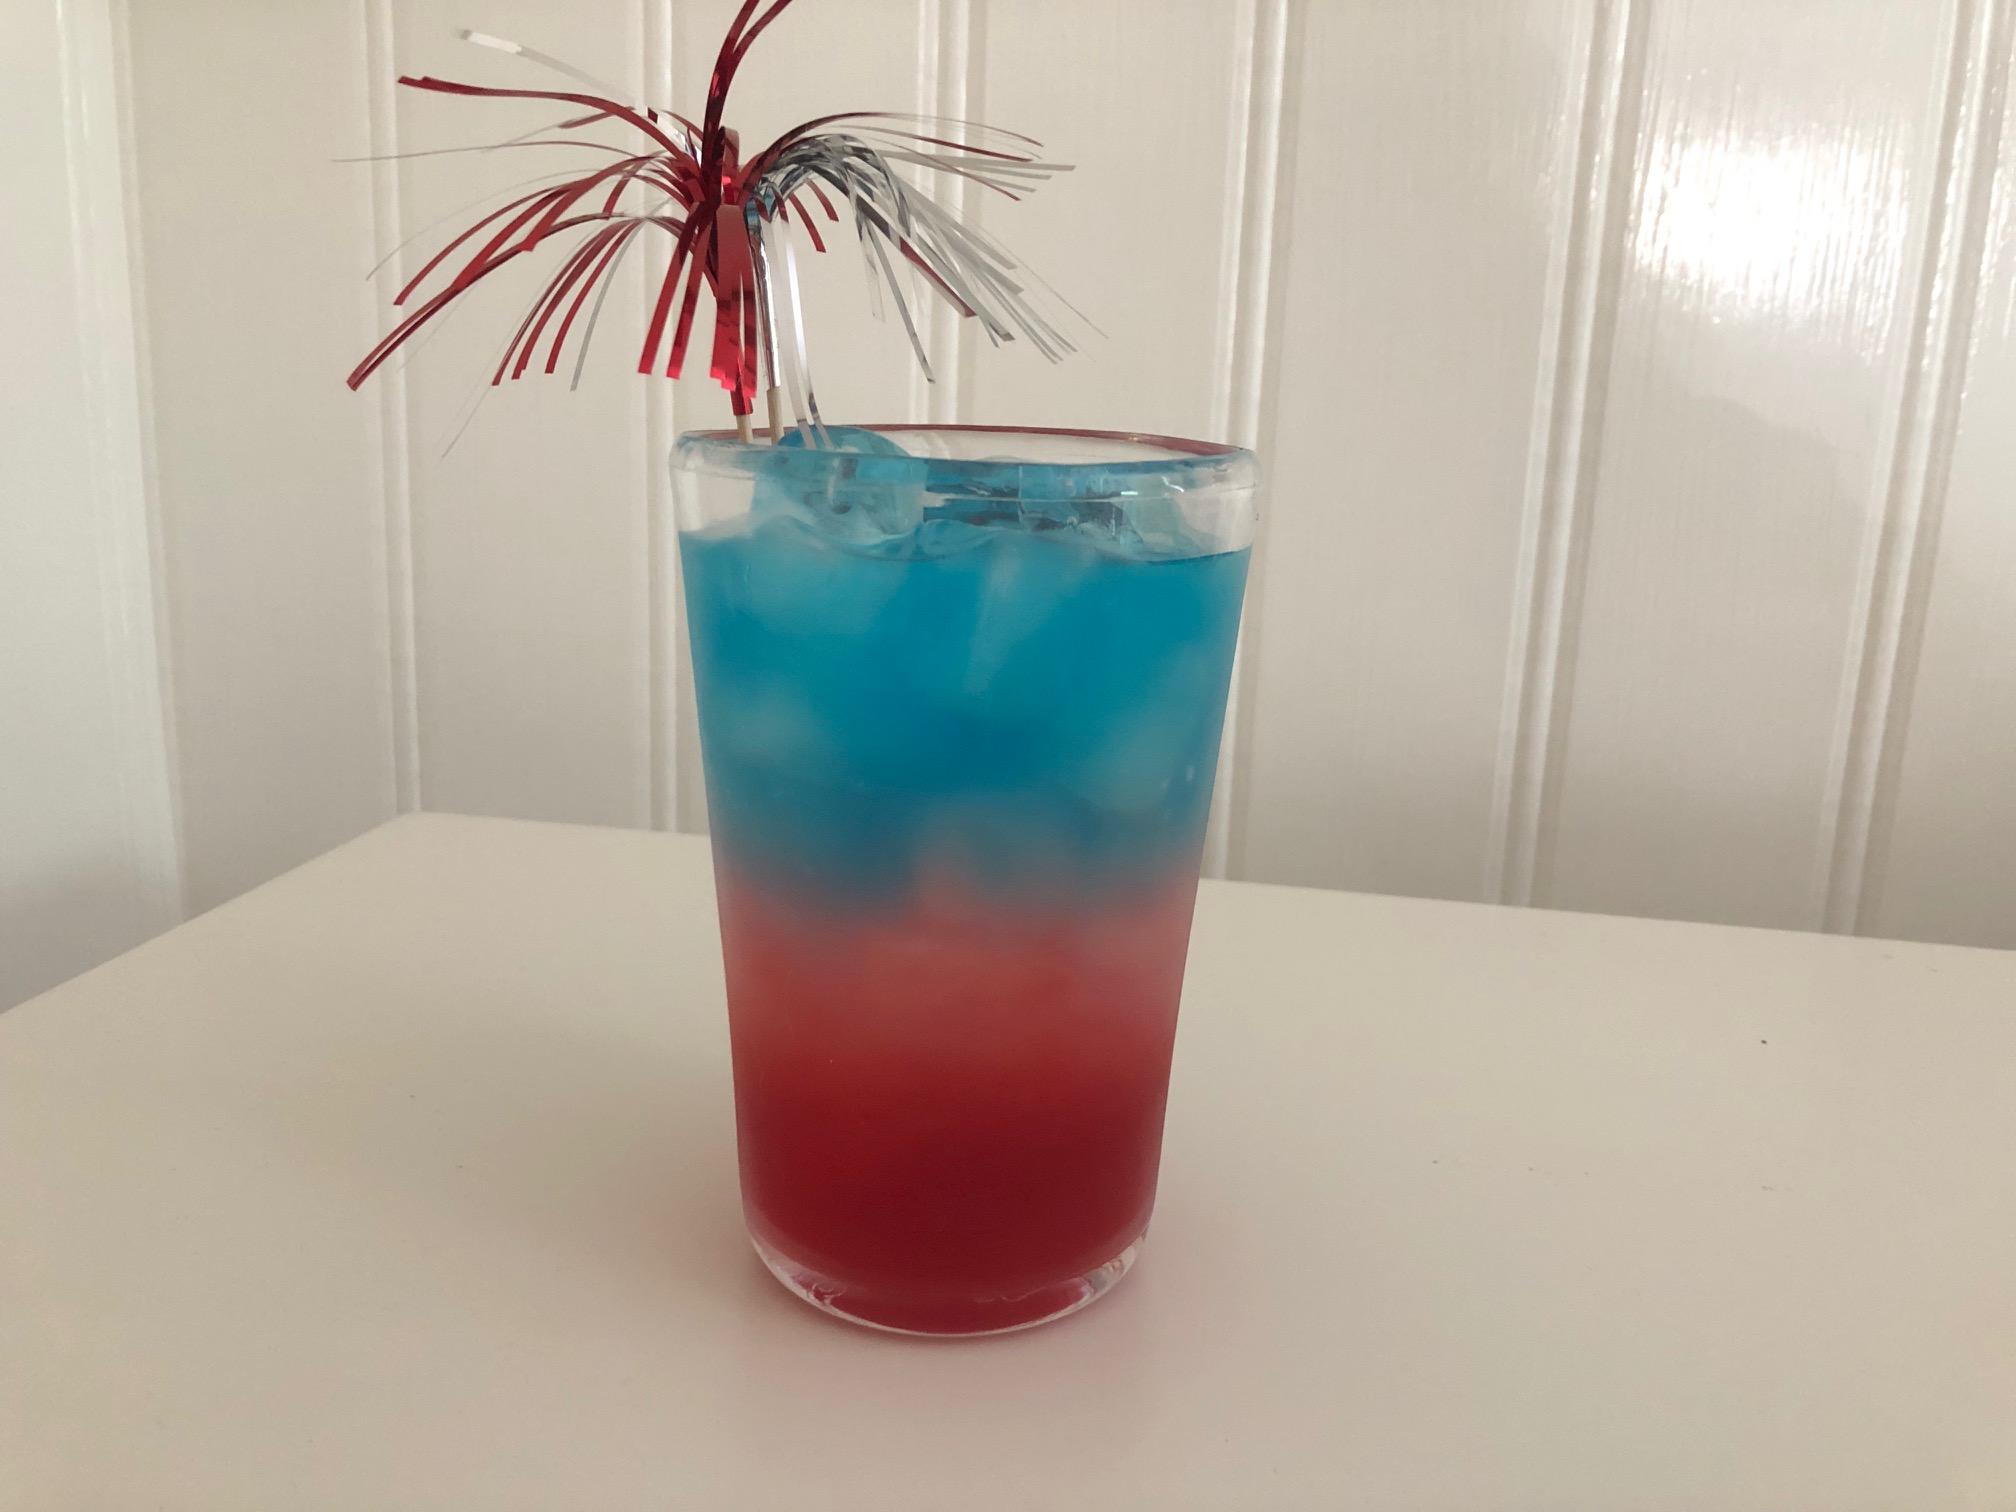 Fourth of July drink recipe - Boston Moms